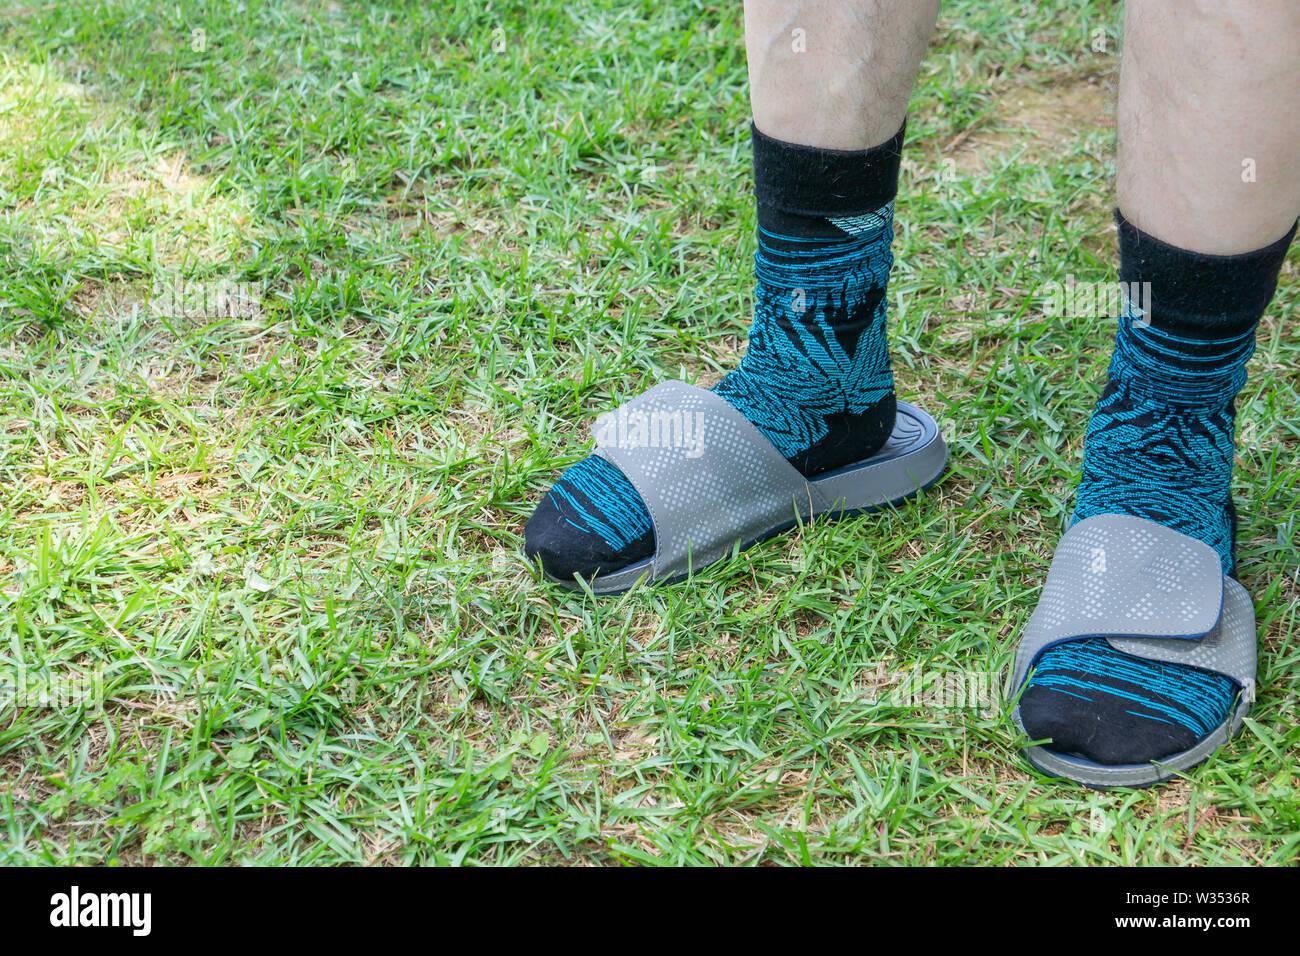 Sandalen Bilder Socken Stockfotosamp; Alamy Und jLqSUGzMVp